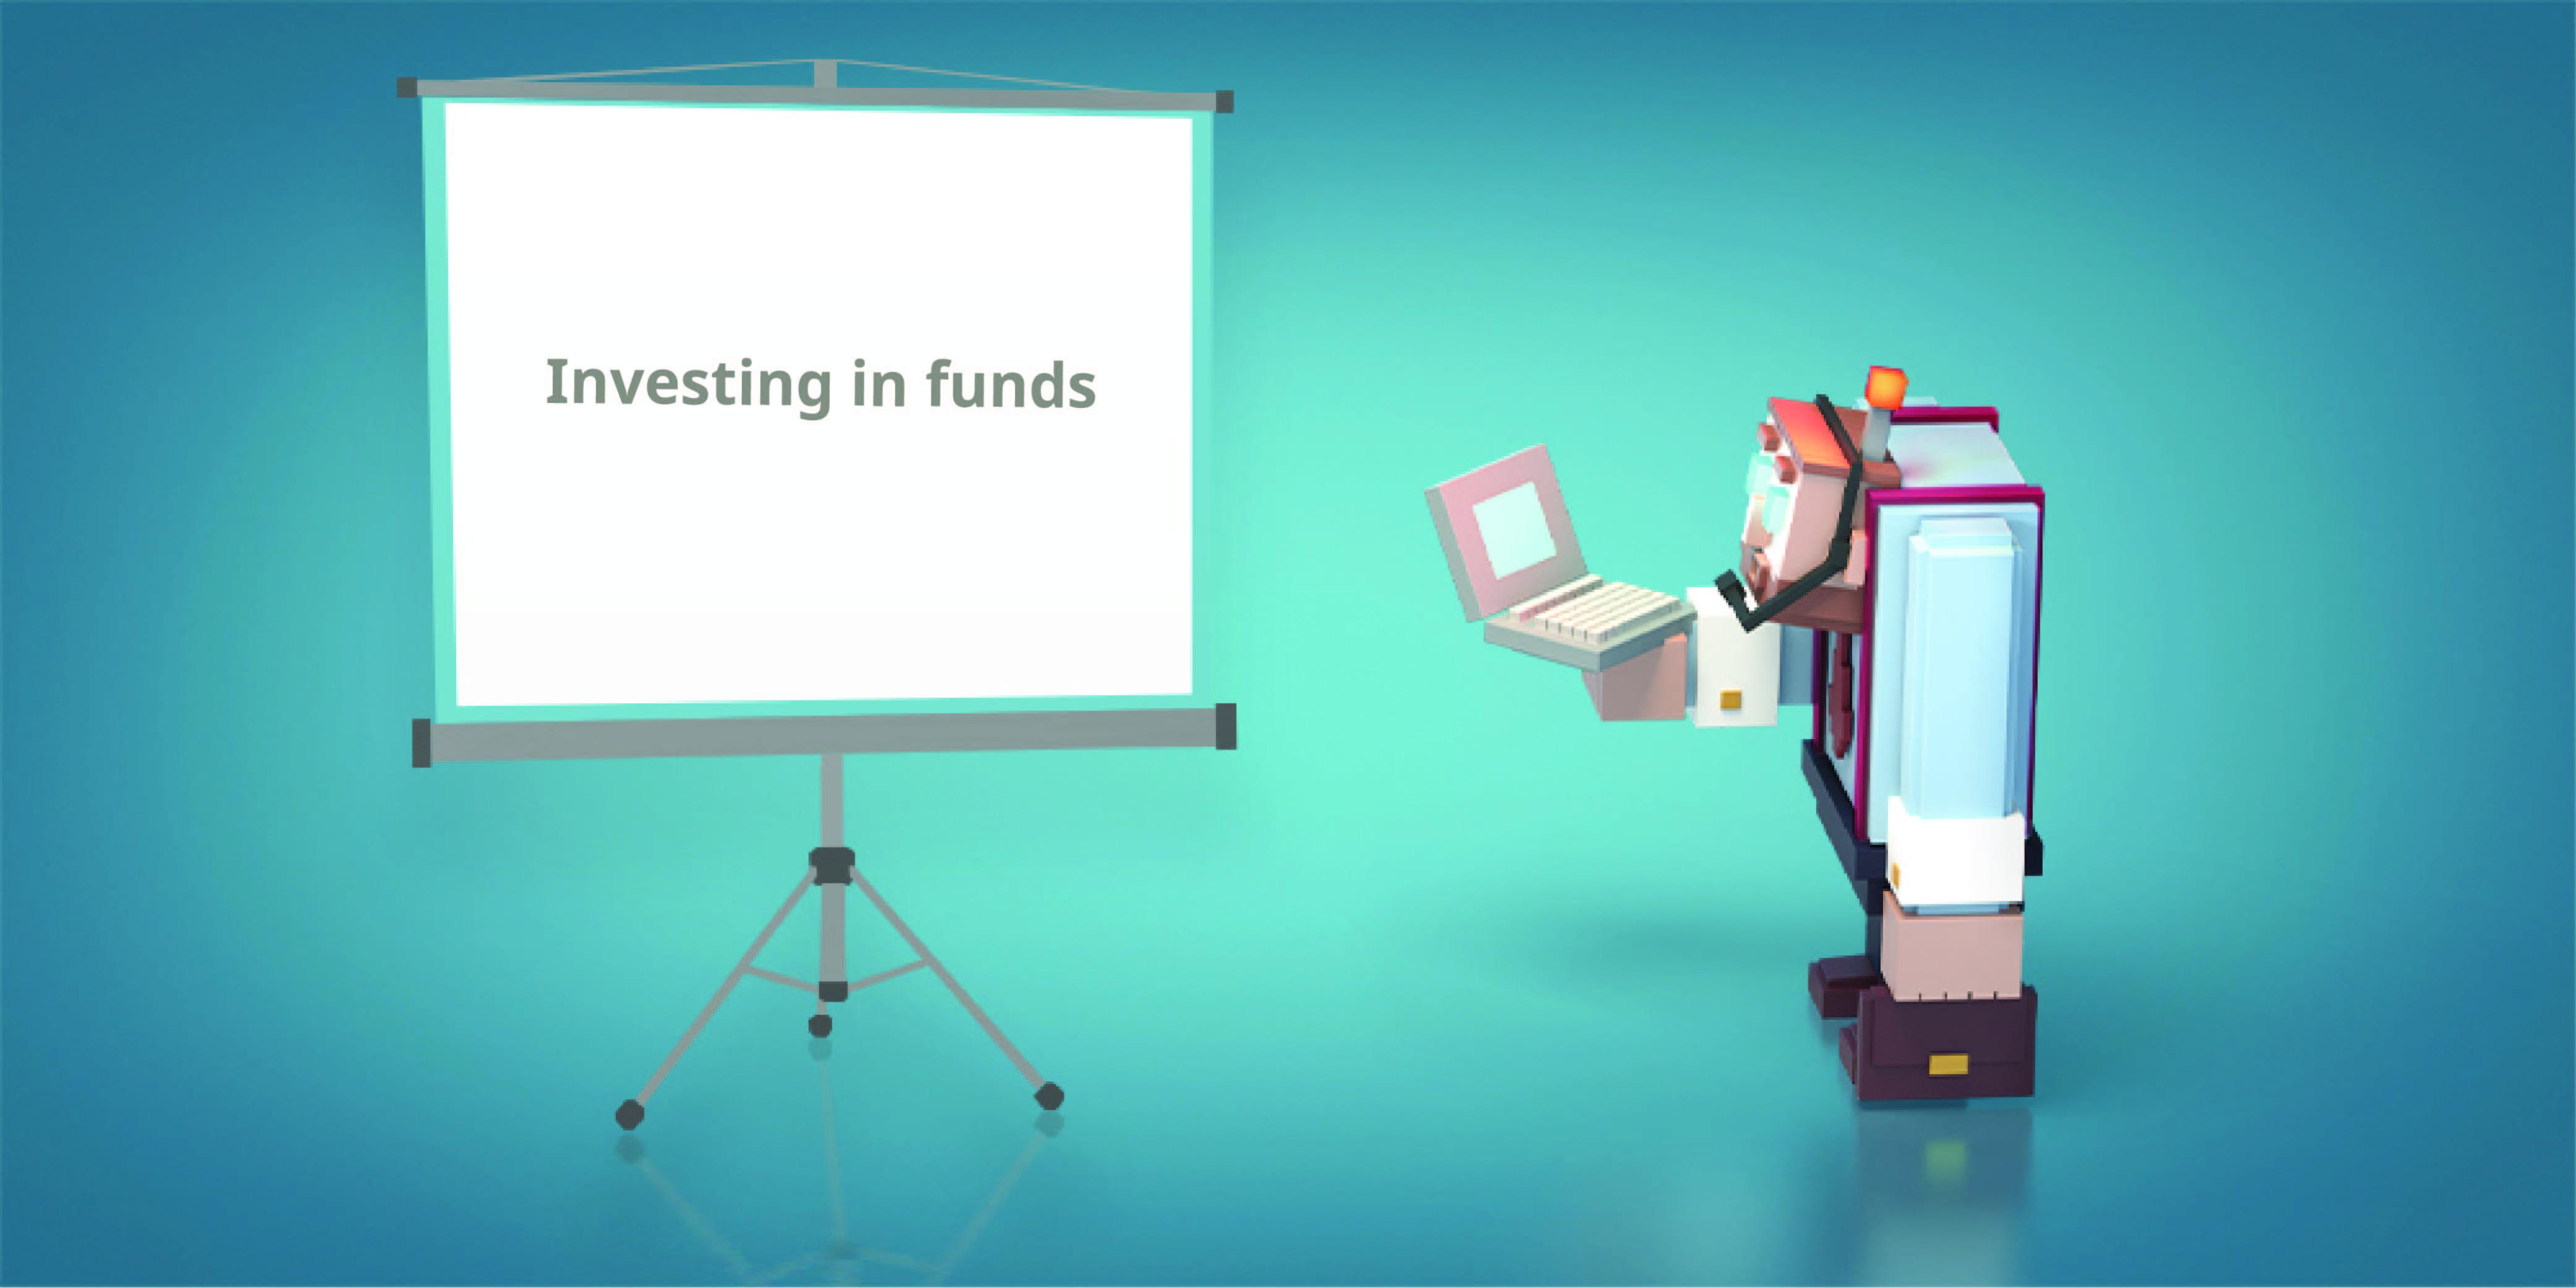 Investir dans des fonds pour Beleggen-Beleggen